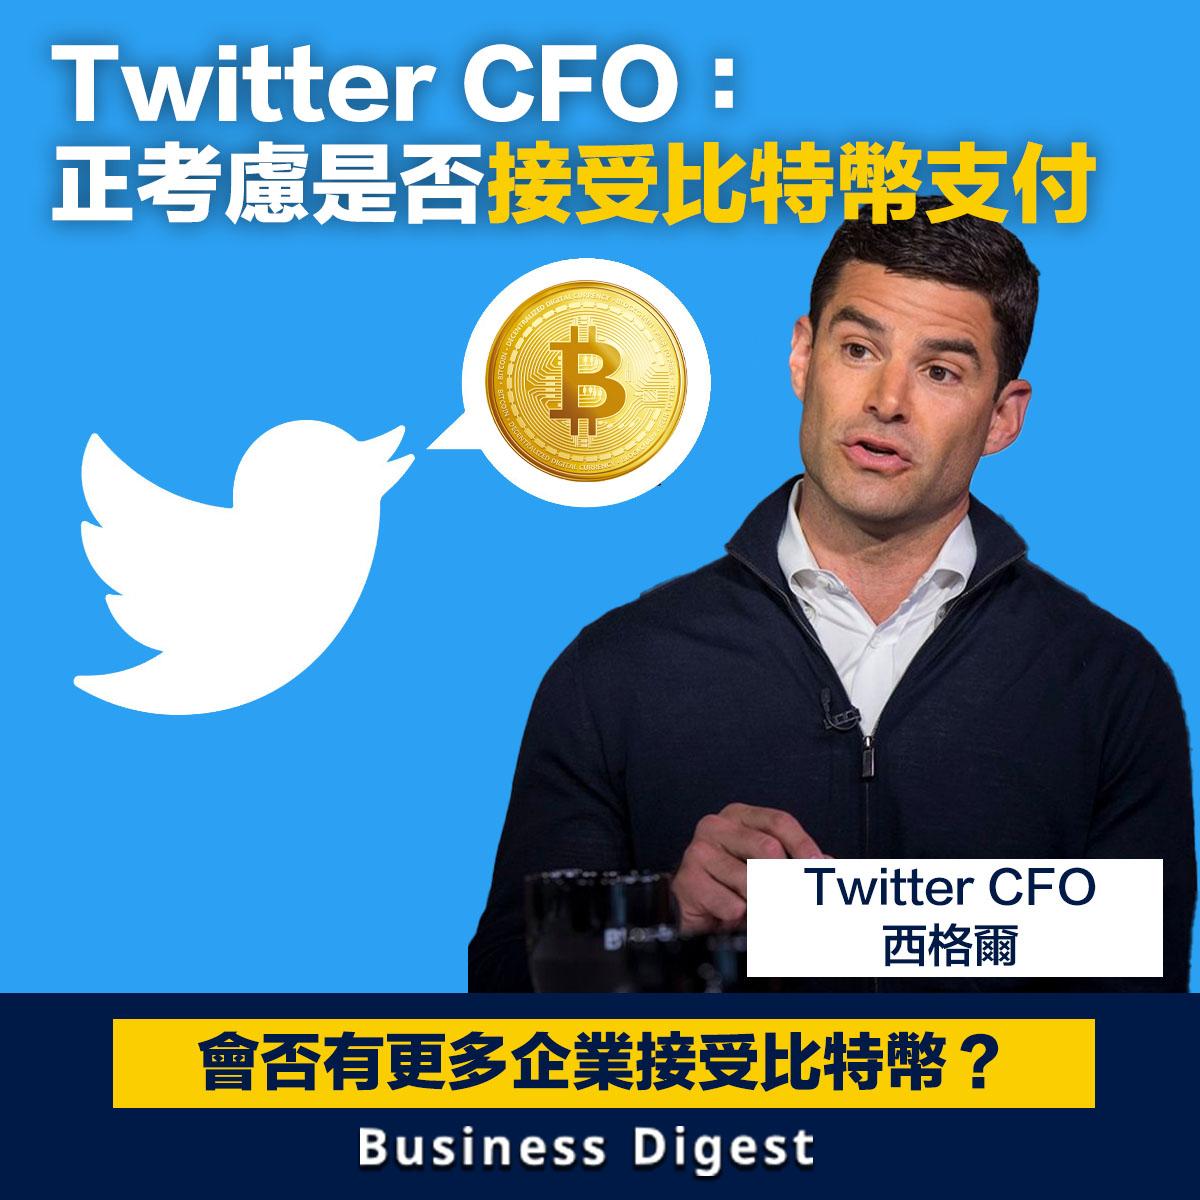 Twitter CFO:正考慮是否接受比特幣支付